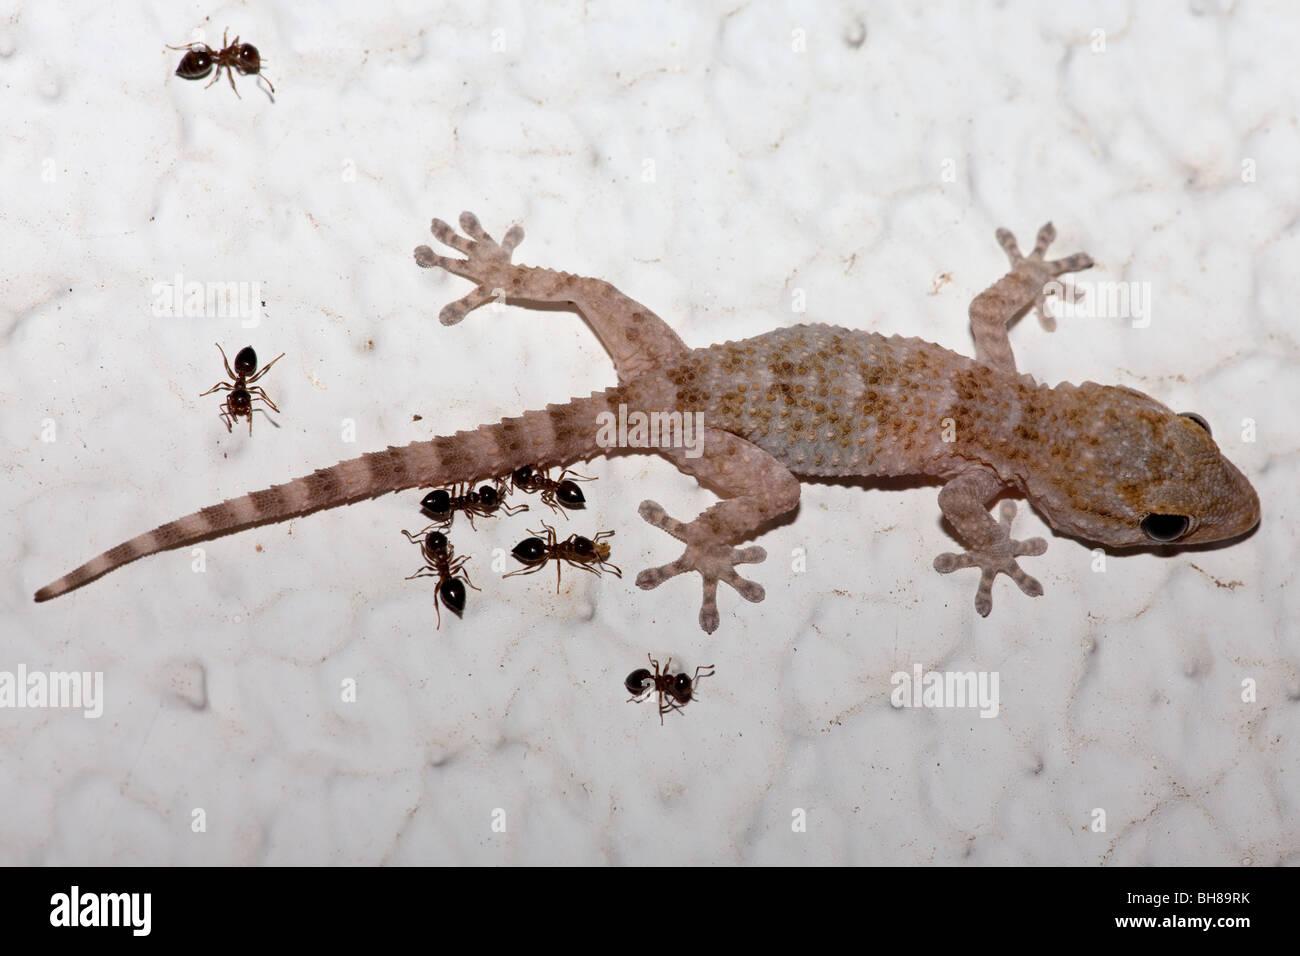 Crocodile gecko stockfotos crocodile gecko bilder alamy - Ameisen in der wand ...